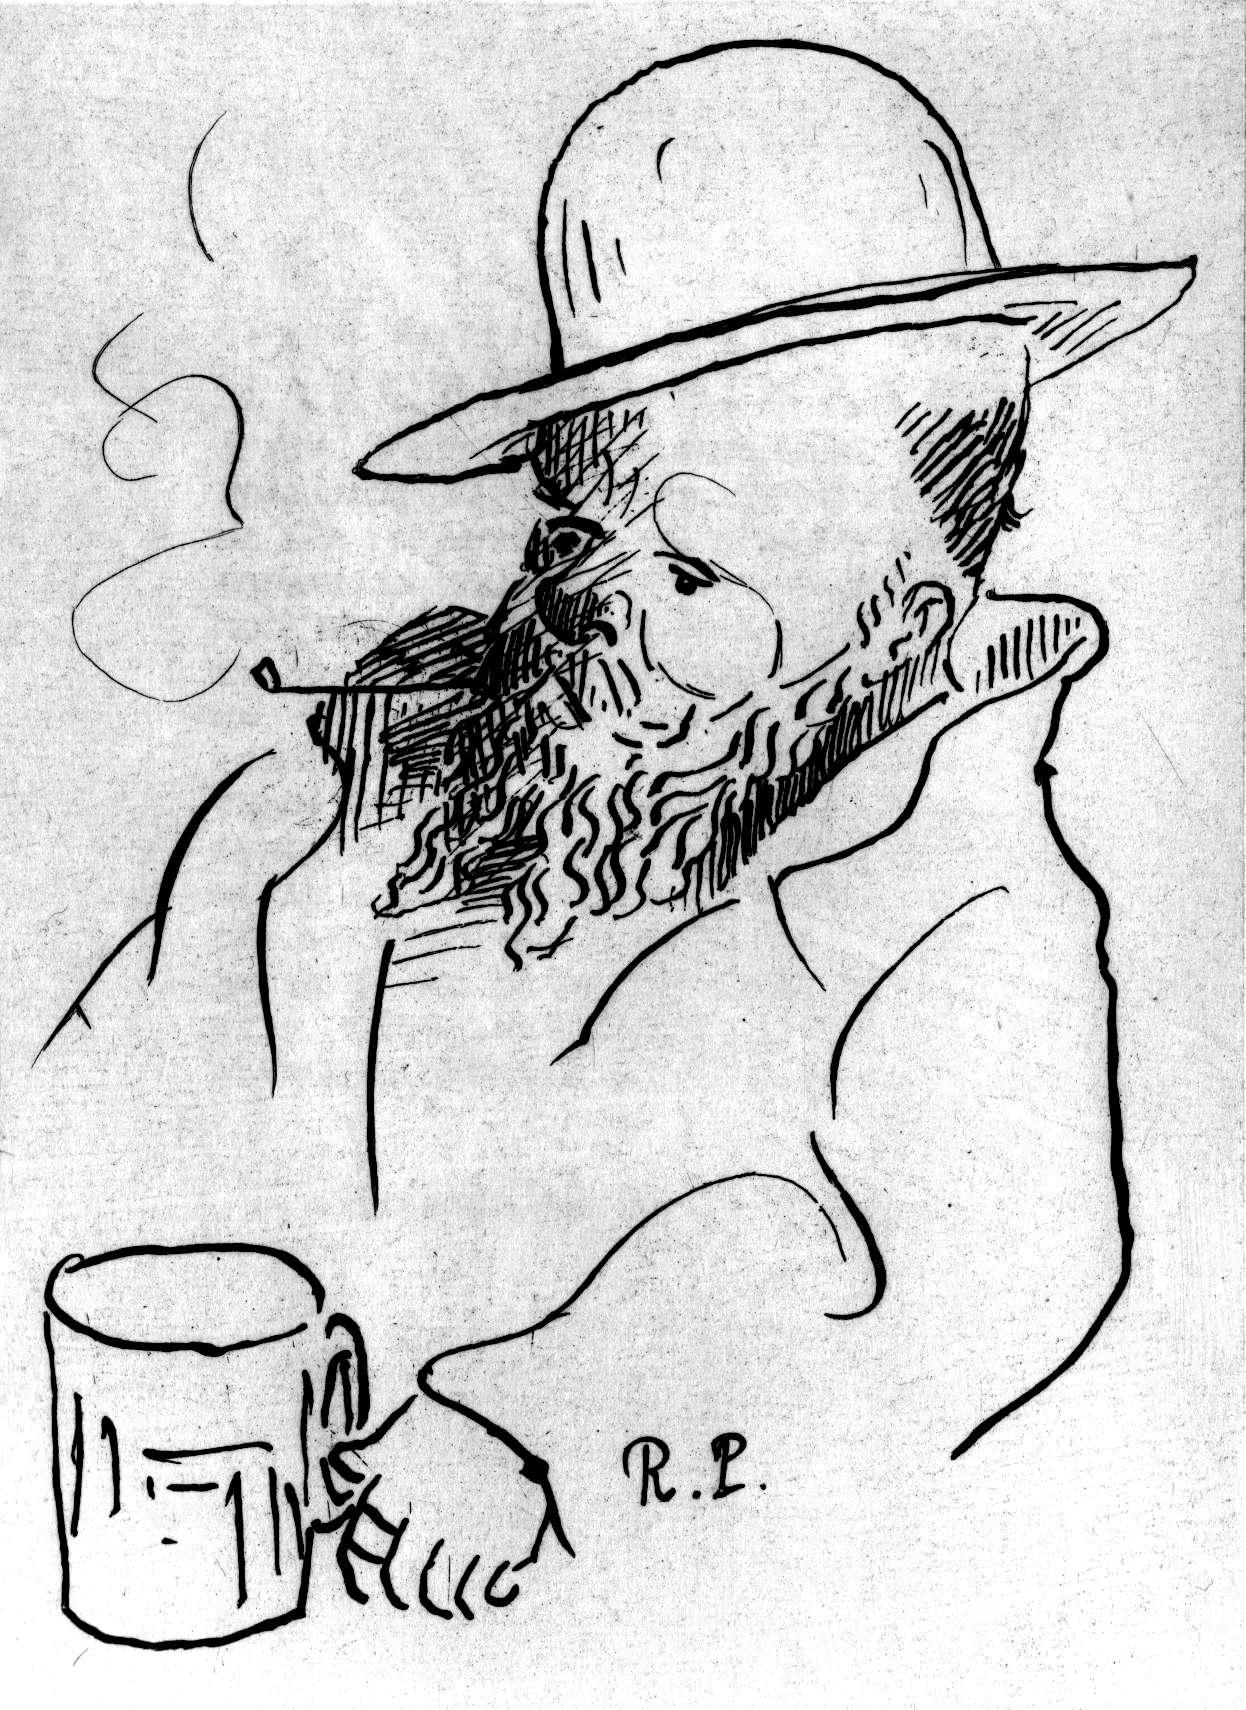 Raoul Ponchon (1848-1937): pseudonyme individuel